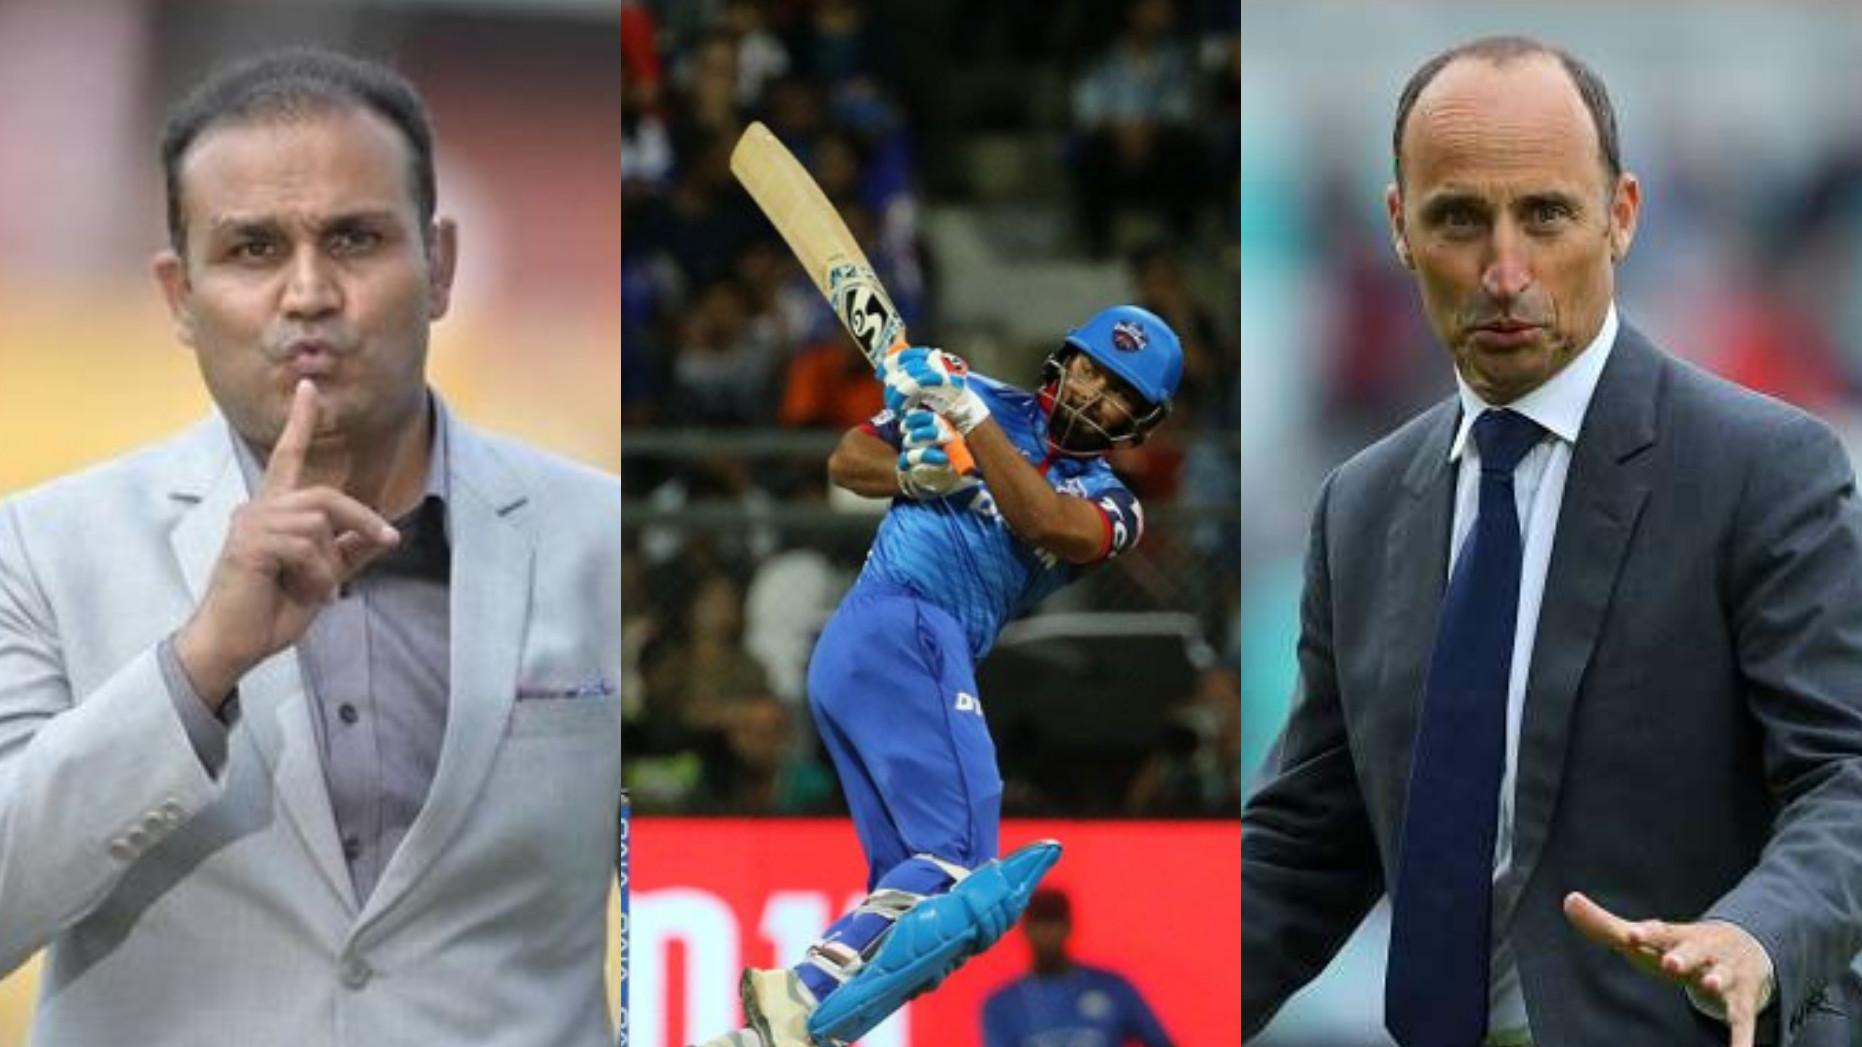 IPL 2019: Cricketing fraternity hails Rishabh Pant as he clobbers Mumbai Indians and helps DC make 213/6